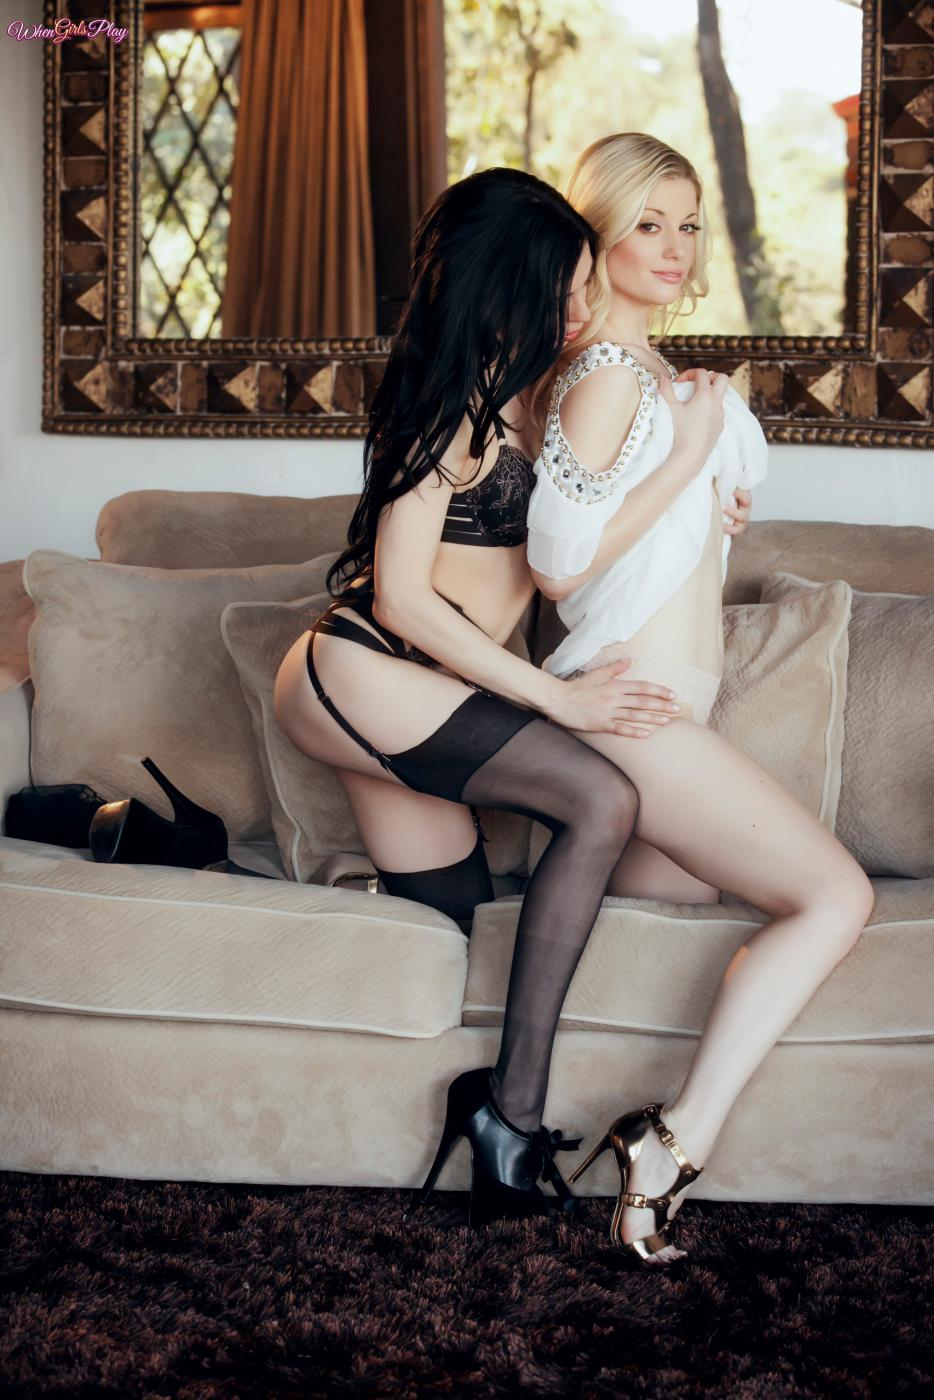 Aiden Ashley Porn aiden ashley porn gallery. gorgeous lesbian babes aiden